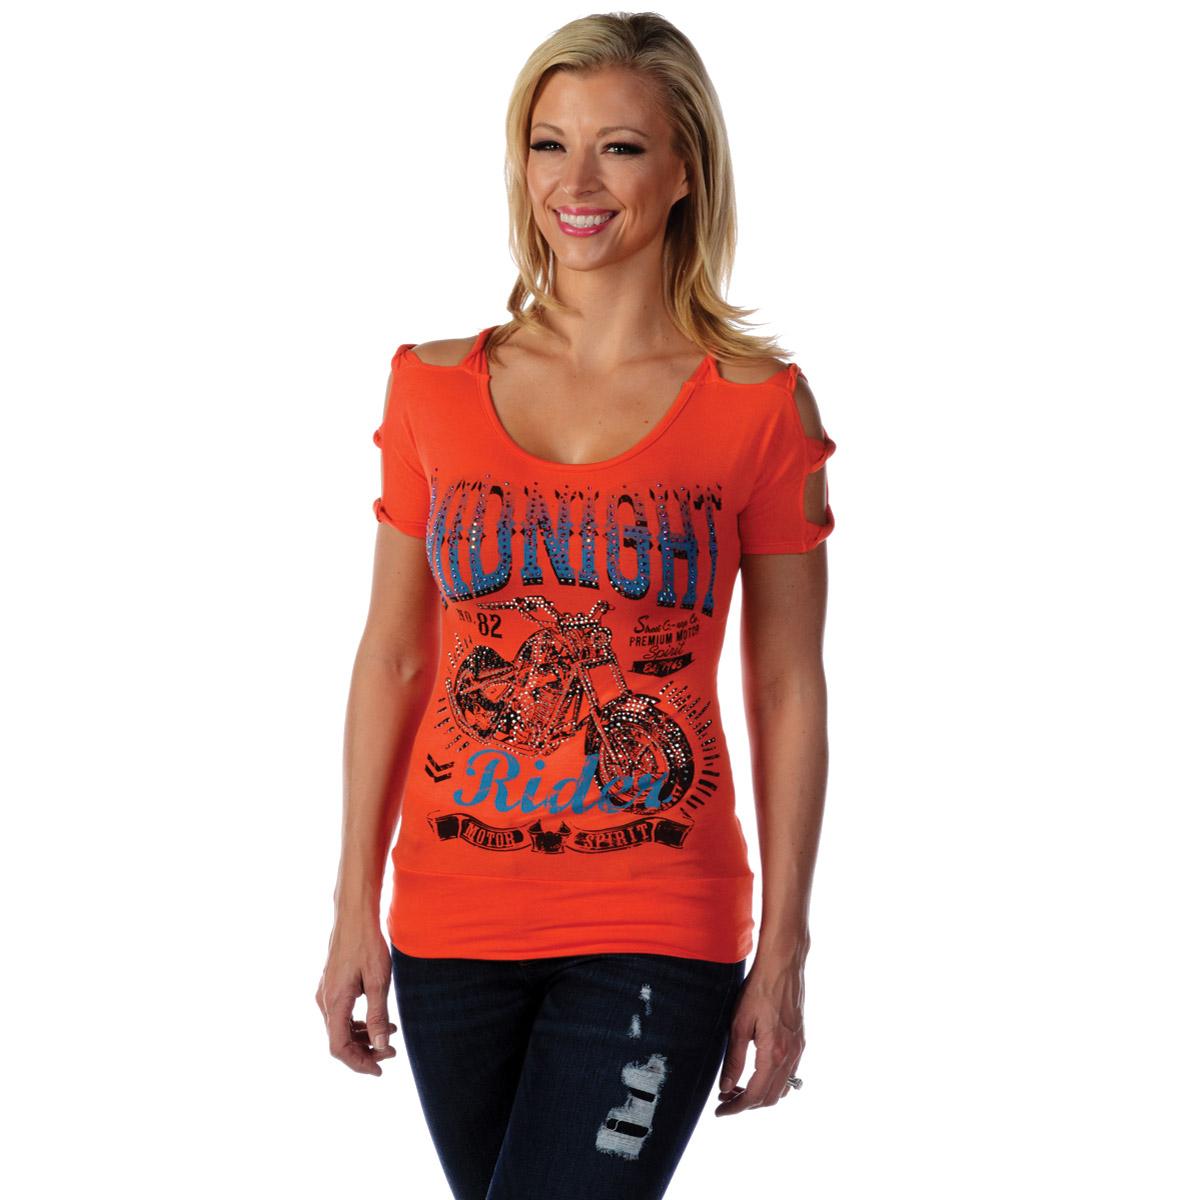 Liberty Wear Women's Midnight Rider Orange Top